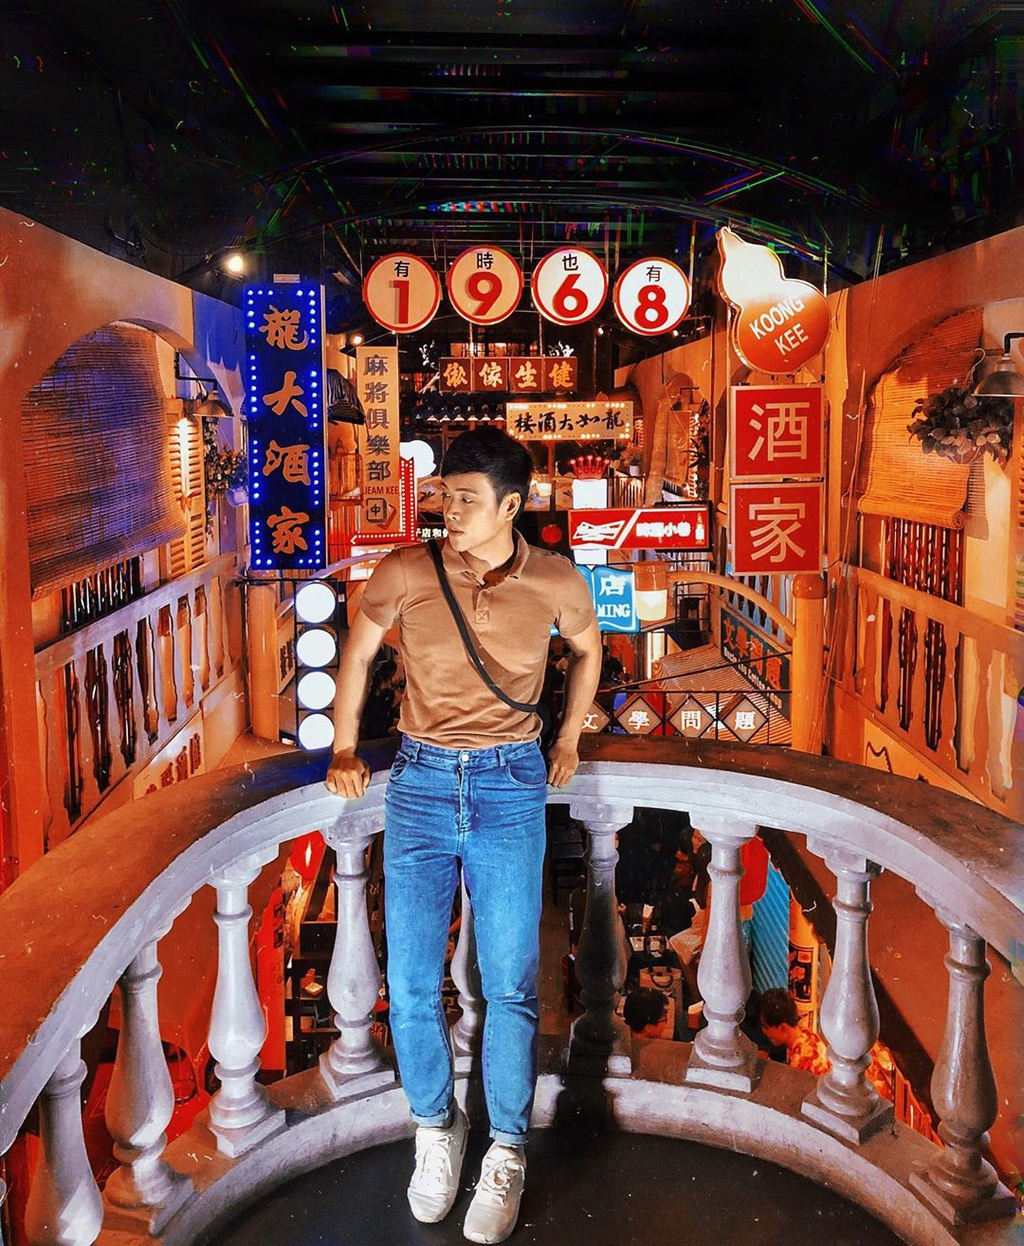 Quan style Hong Kong o TP.HCM anh 7